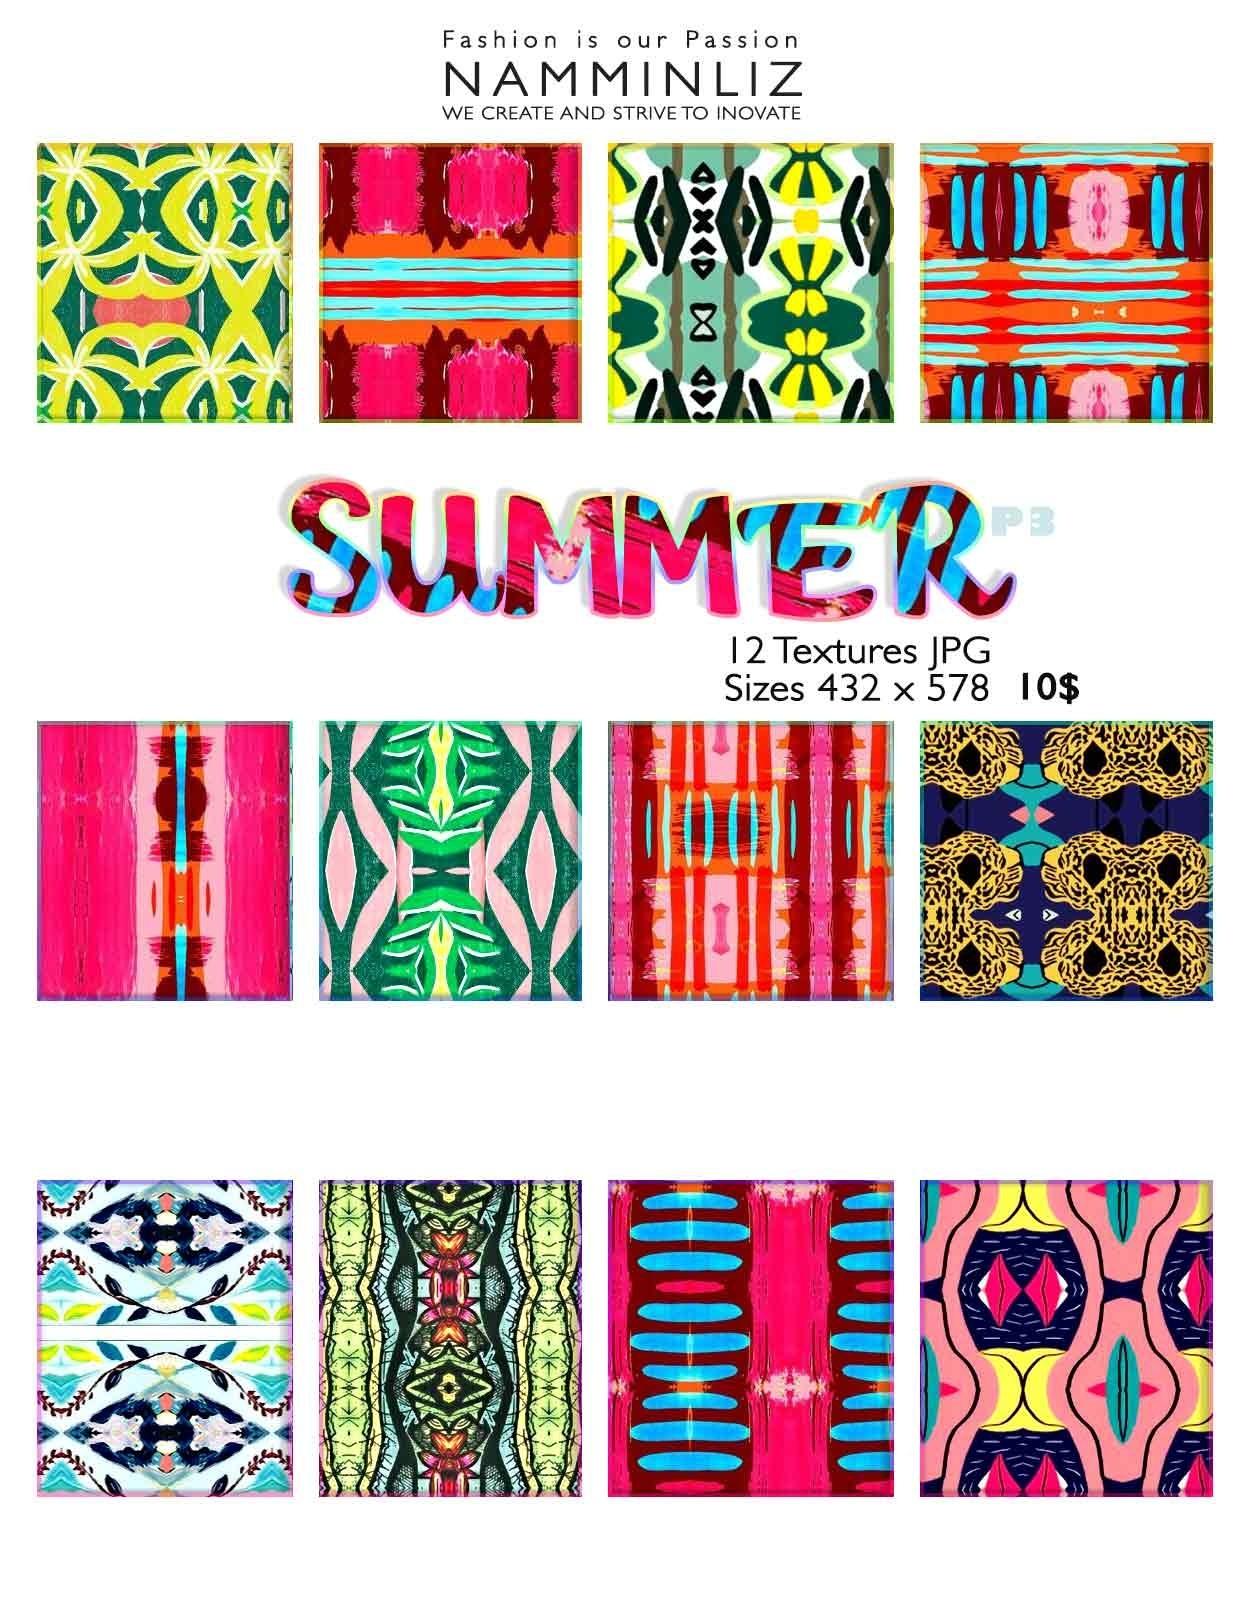 Summer Textures Full  • 48 Textures JPG imvu NAMMINLIZ